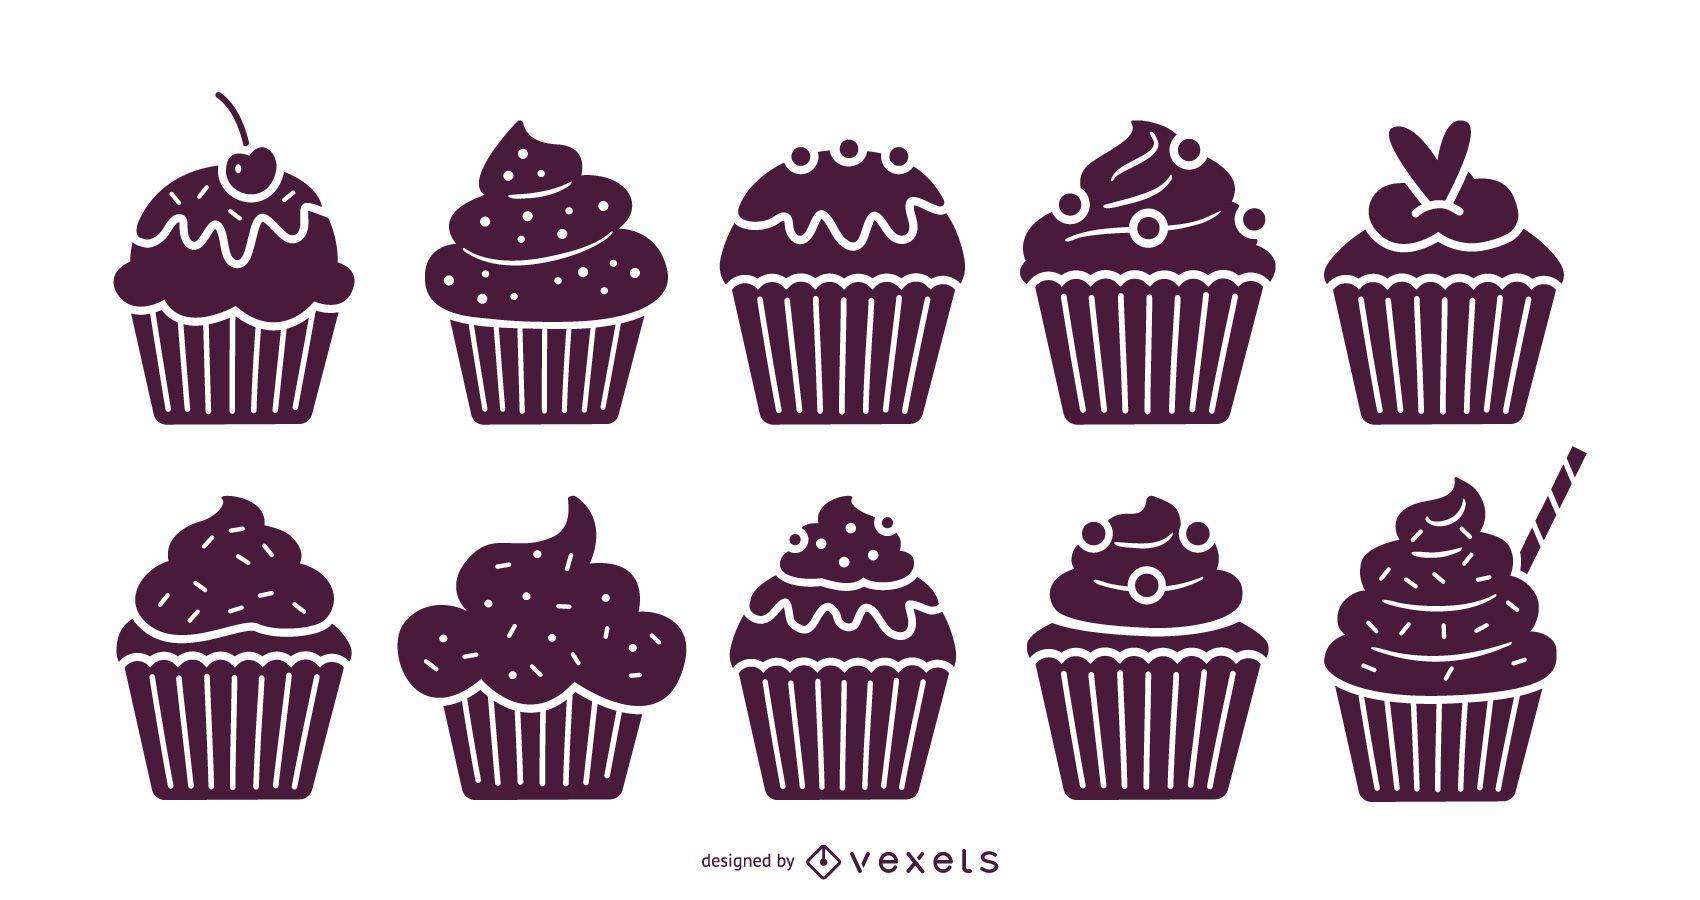 Cupcakes illustration set